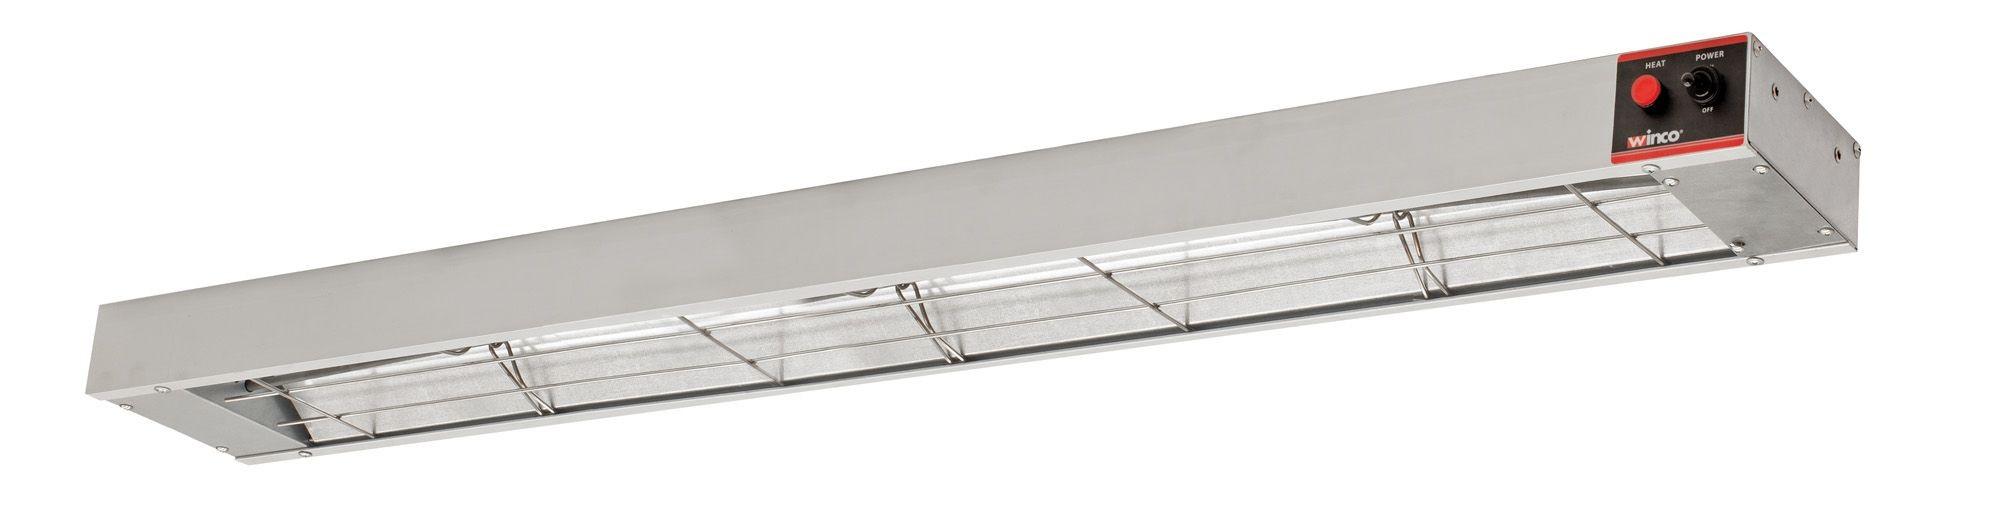 "Winco ESH-48 48"" Electric Infrared Strip Heater"